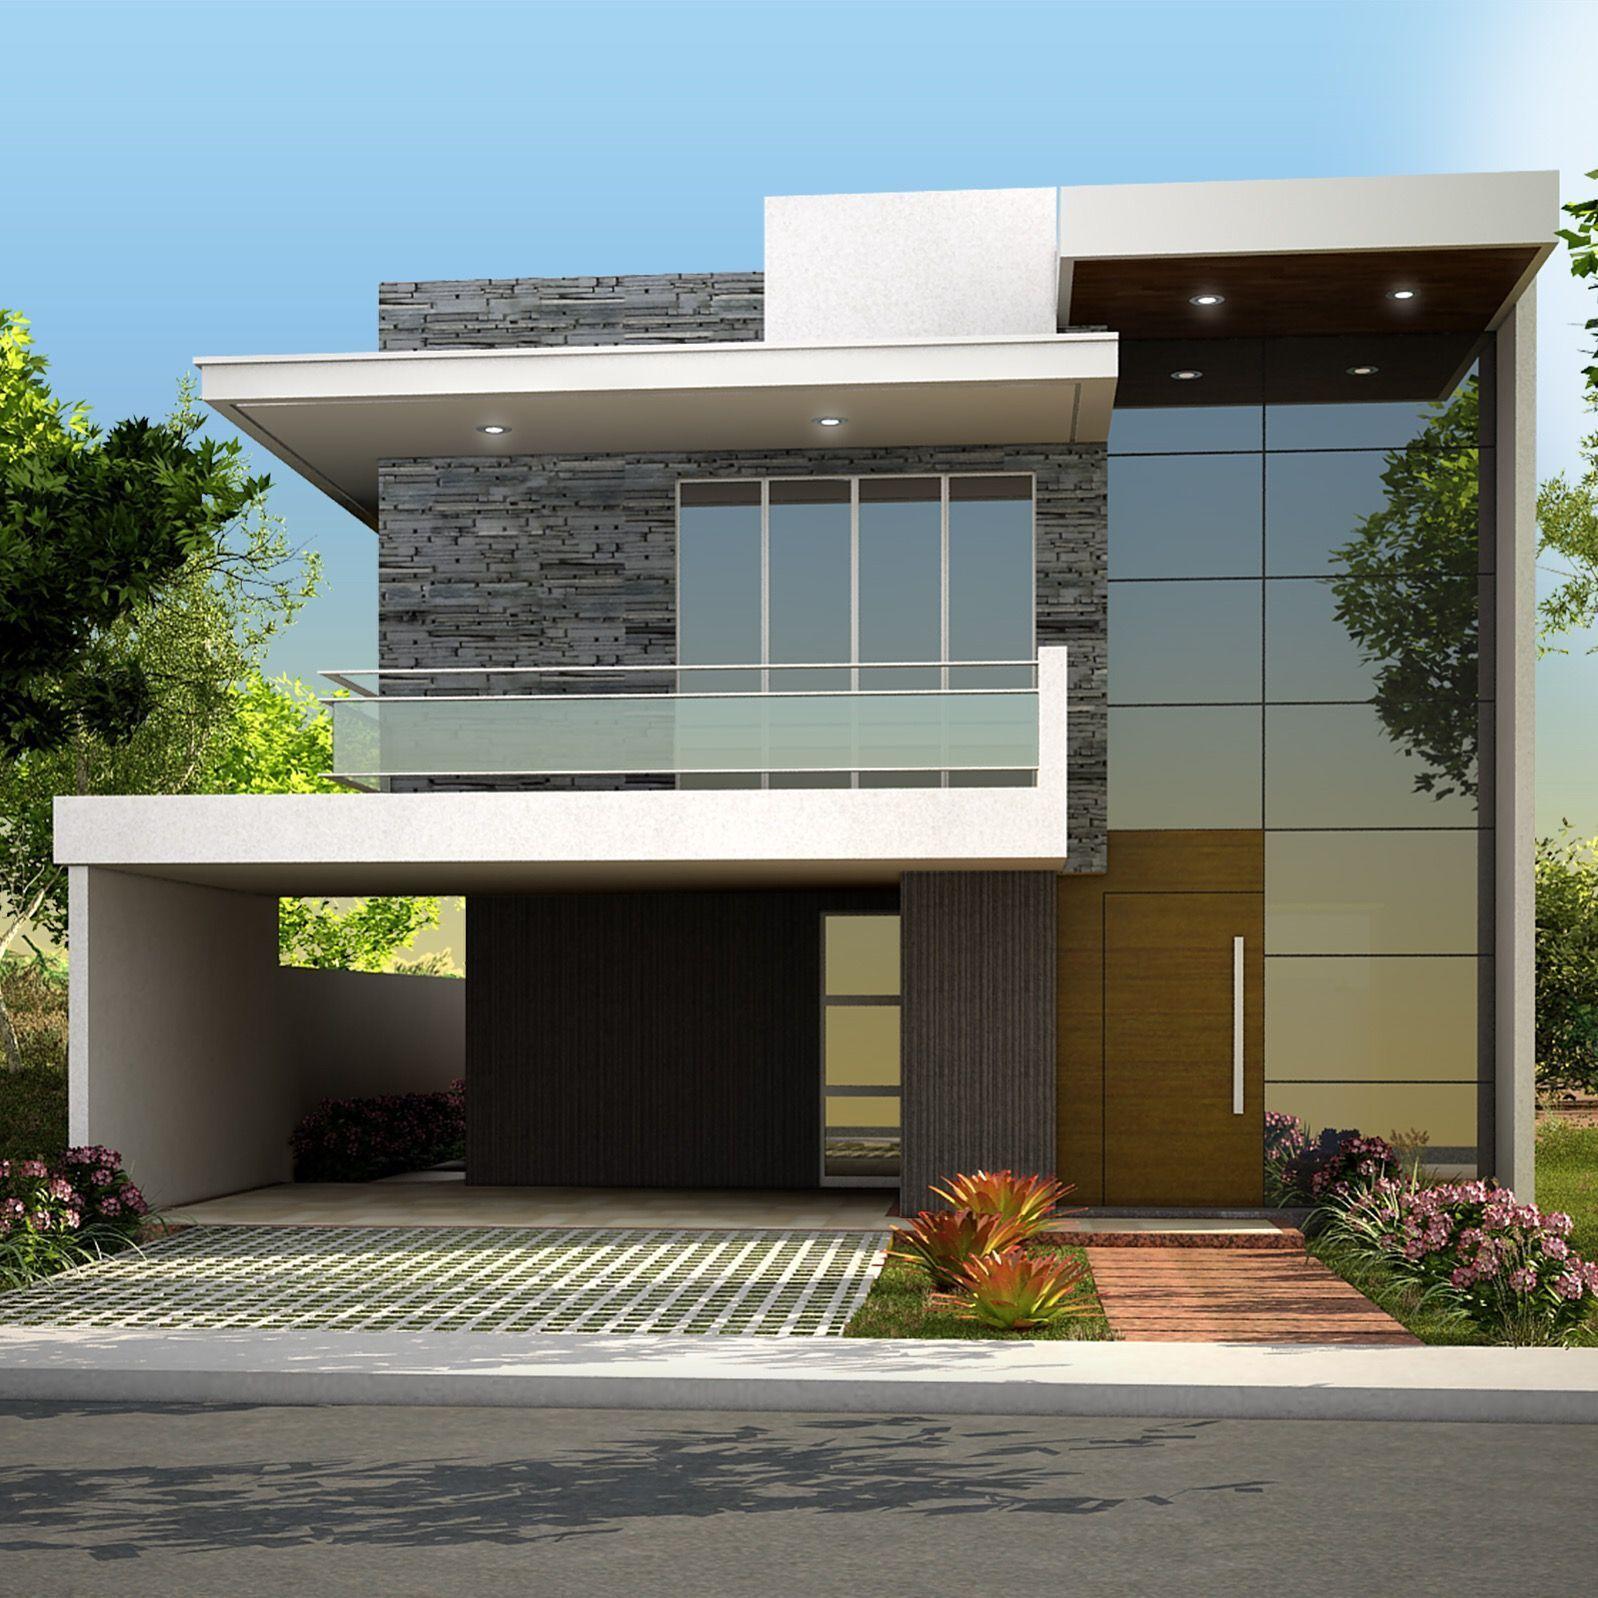 Casasminimalistasinteriores casas y cosas modernas for Arquitectura moderna casas pequenas